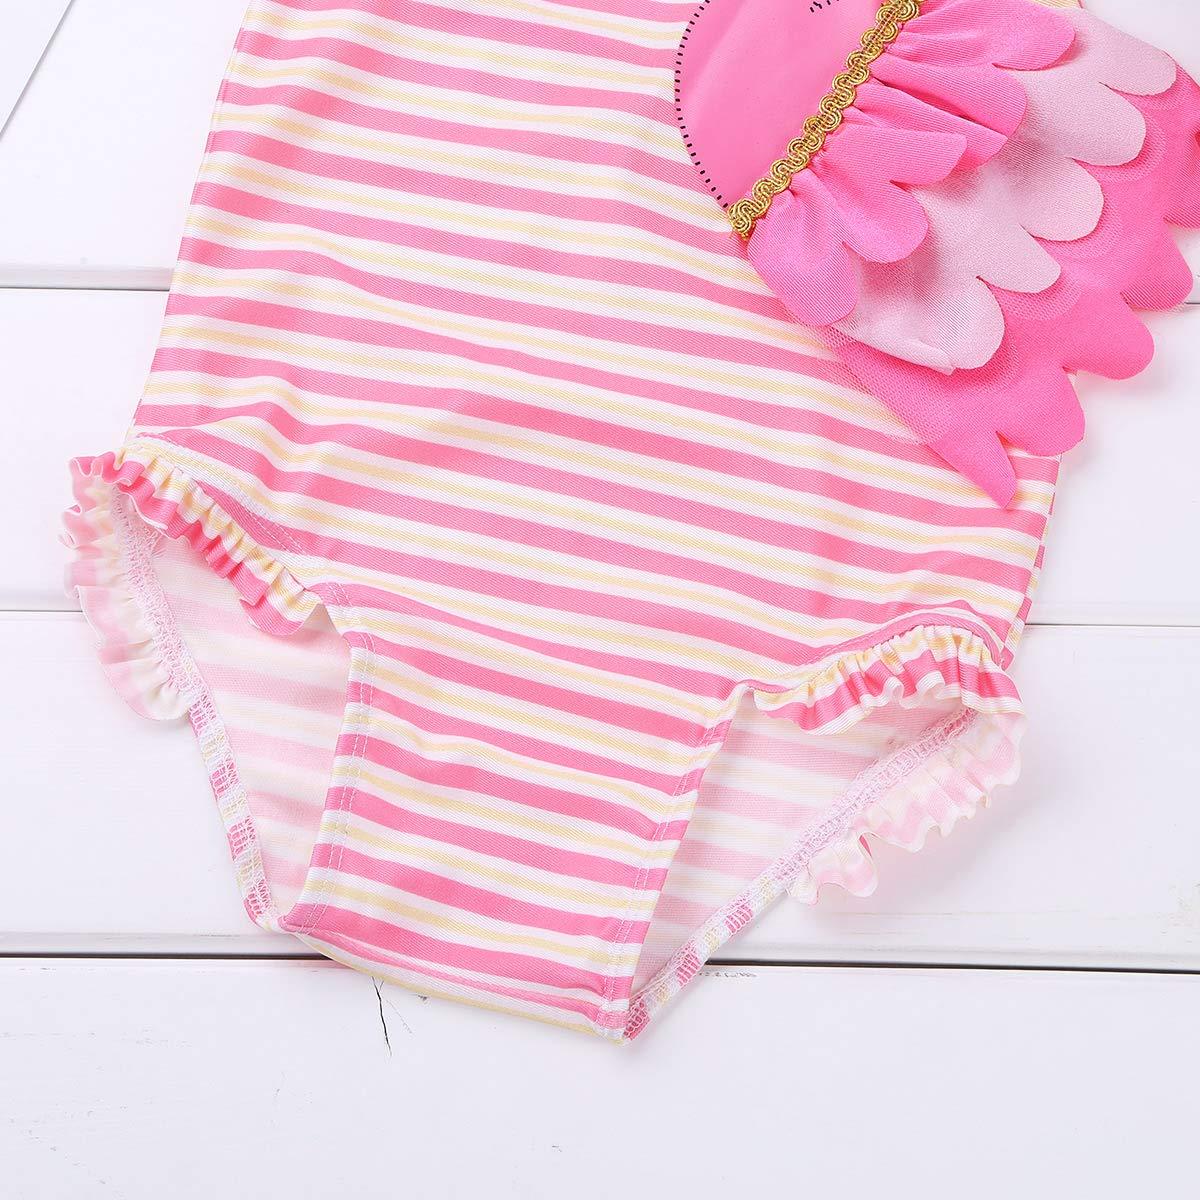 TiaoBug Infant Baby Girls One-Piece Elastic Halter Flamingo Swimsuit Swimwear Summer Holiday Bikini Tops Bathing Suit